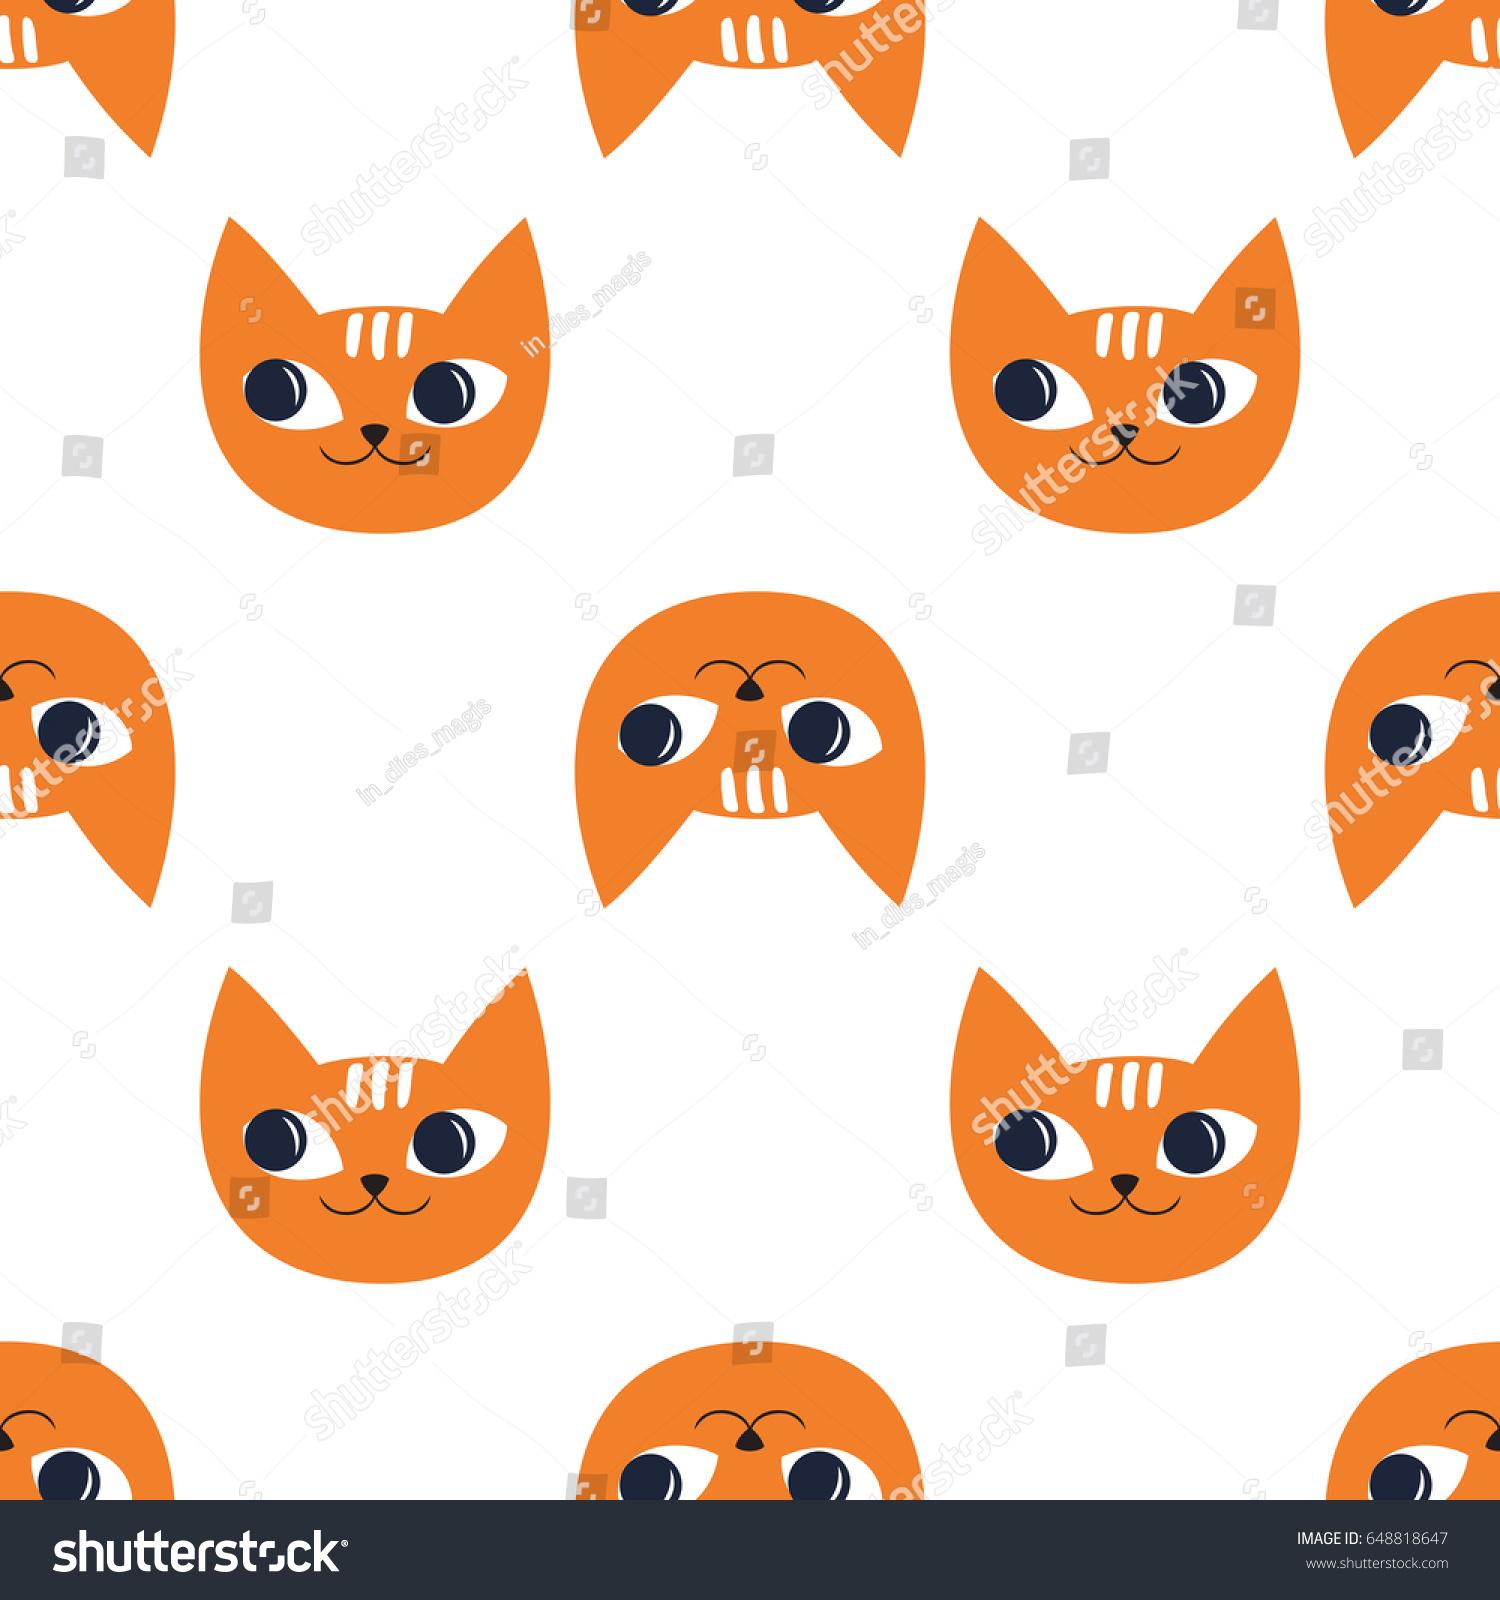 Cute Cats Seamless Pattern On White 648818647